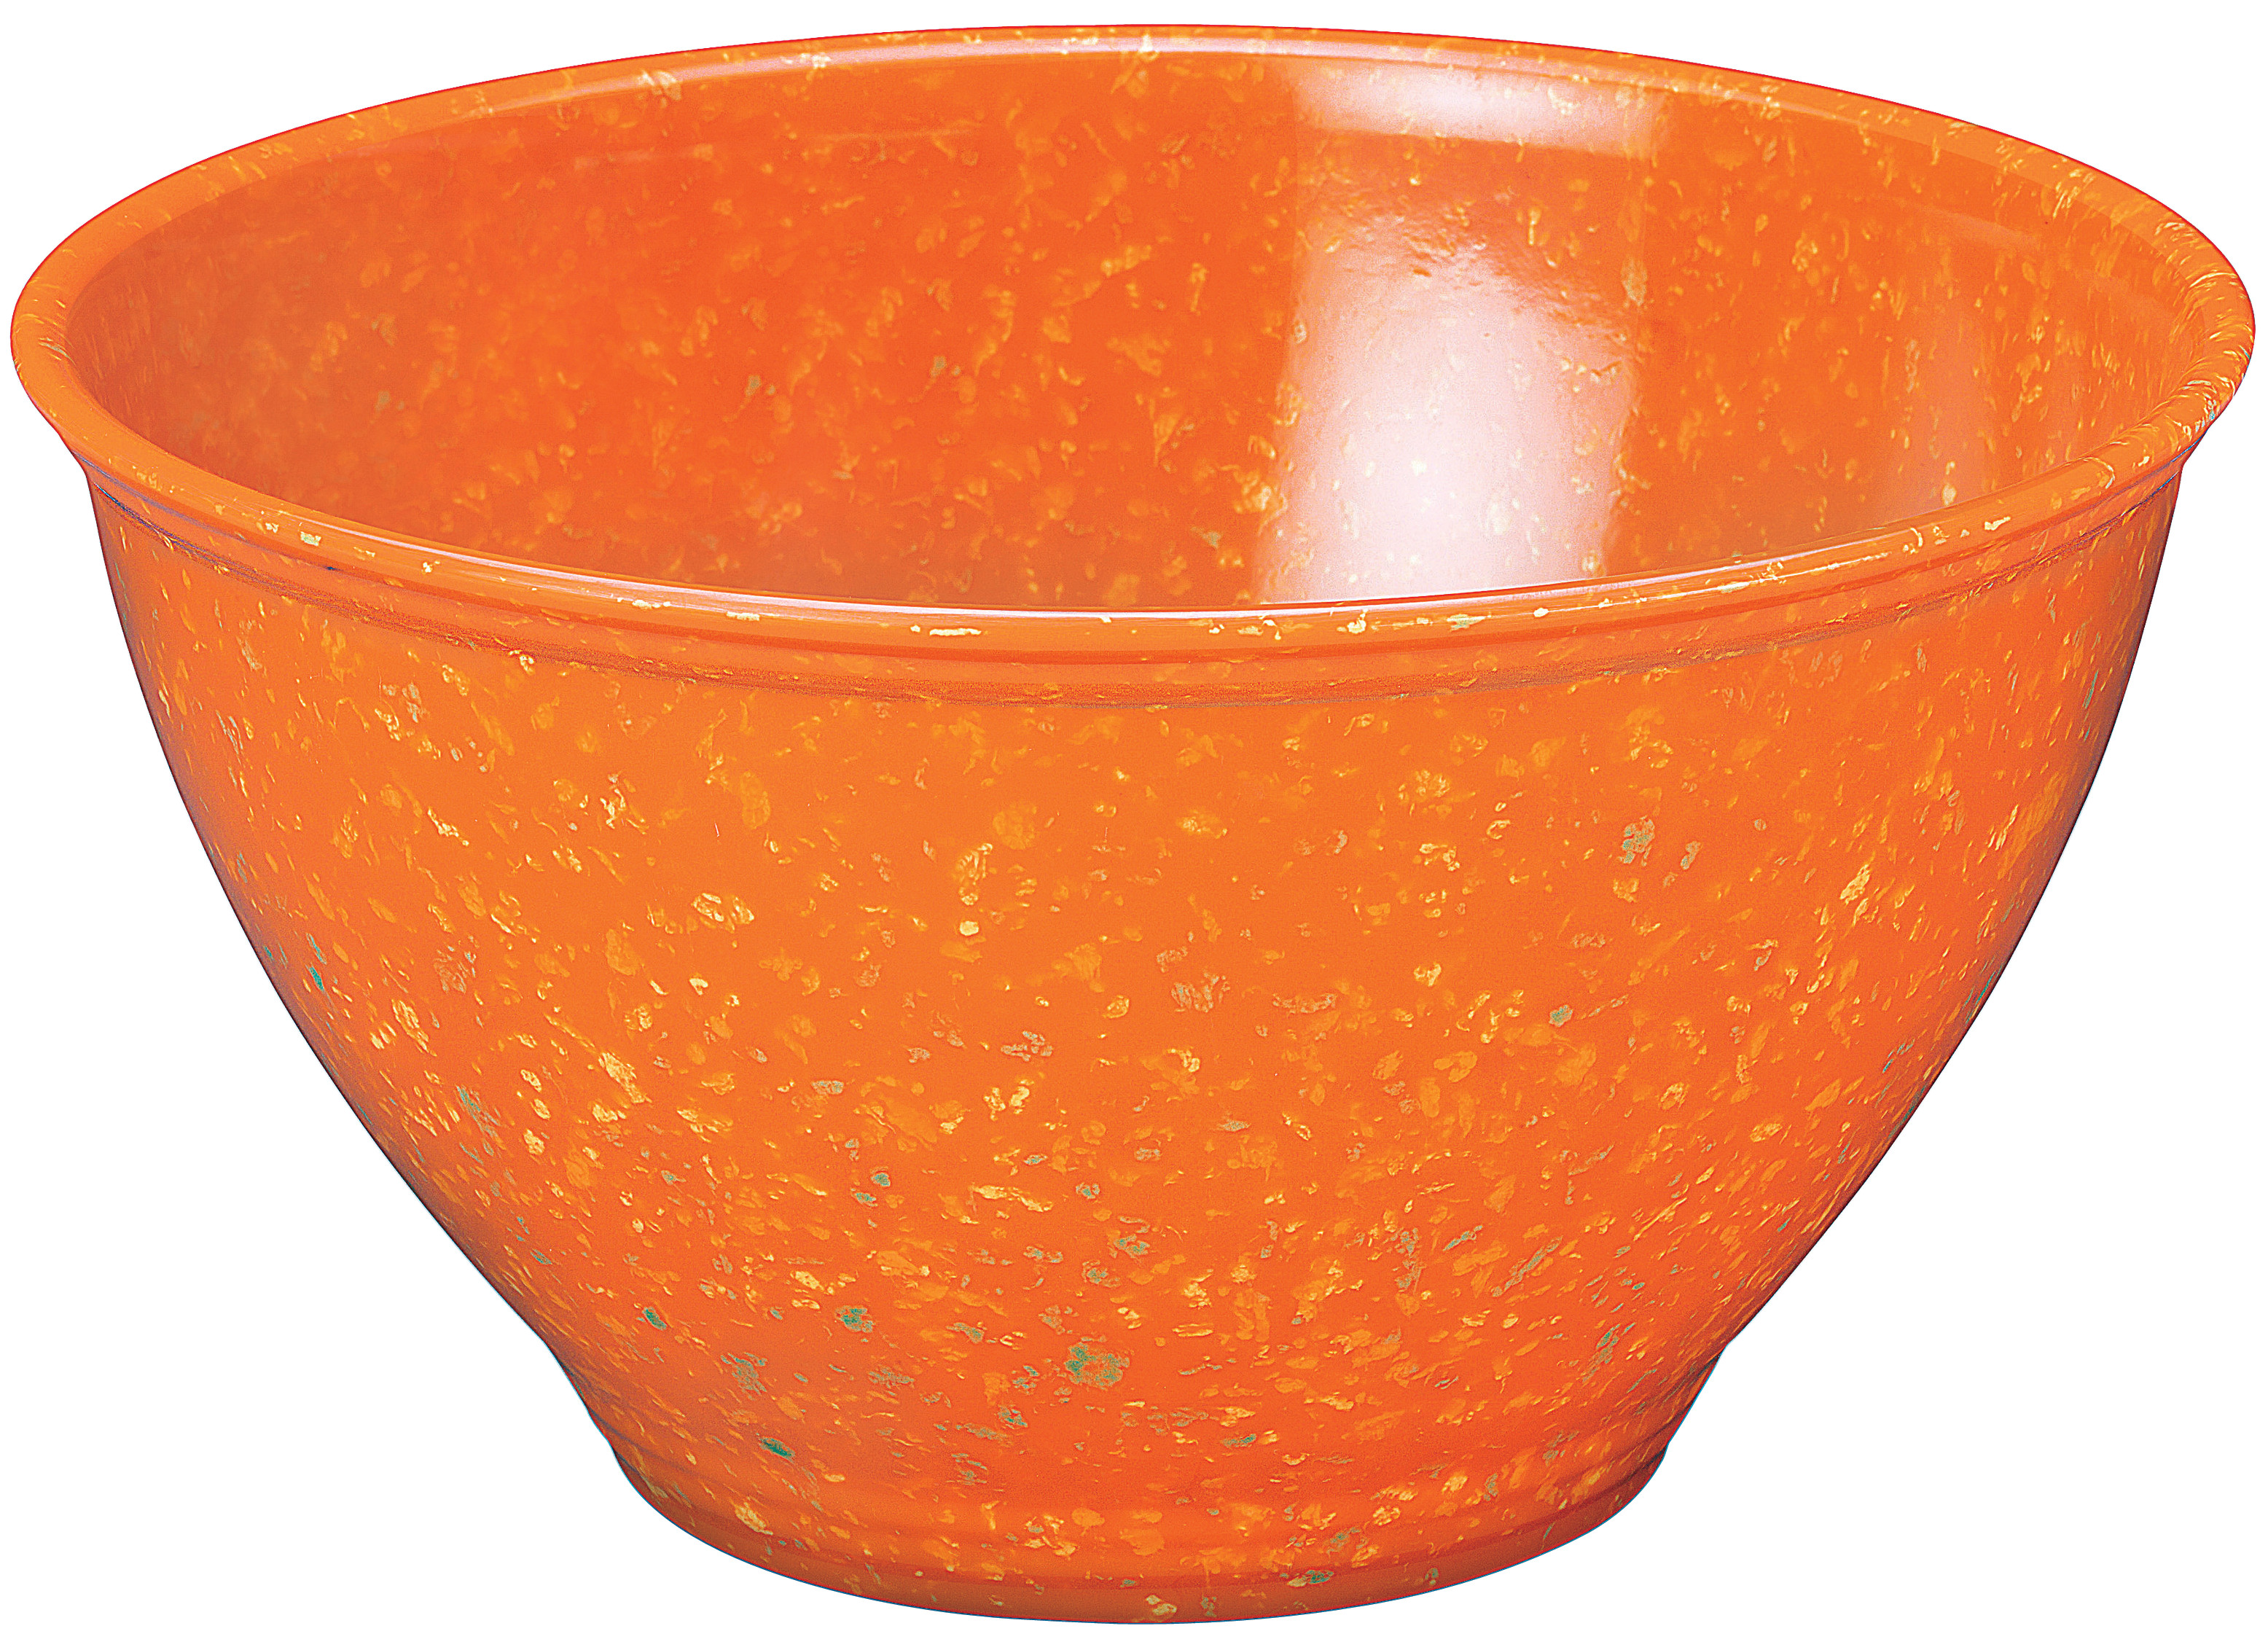 Rachael Ray Accessories Garbage Bowl, Orange